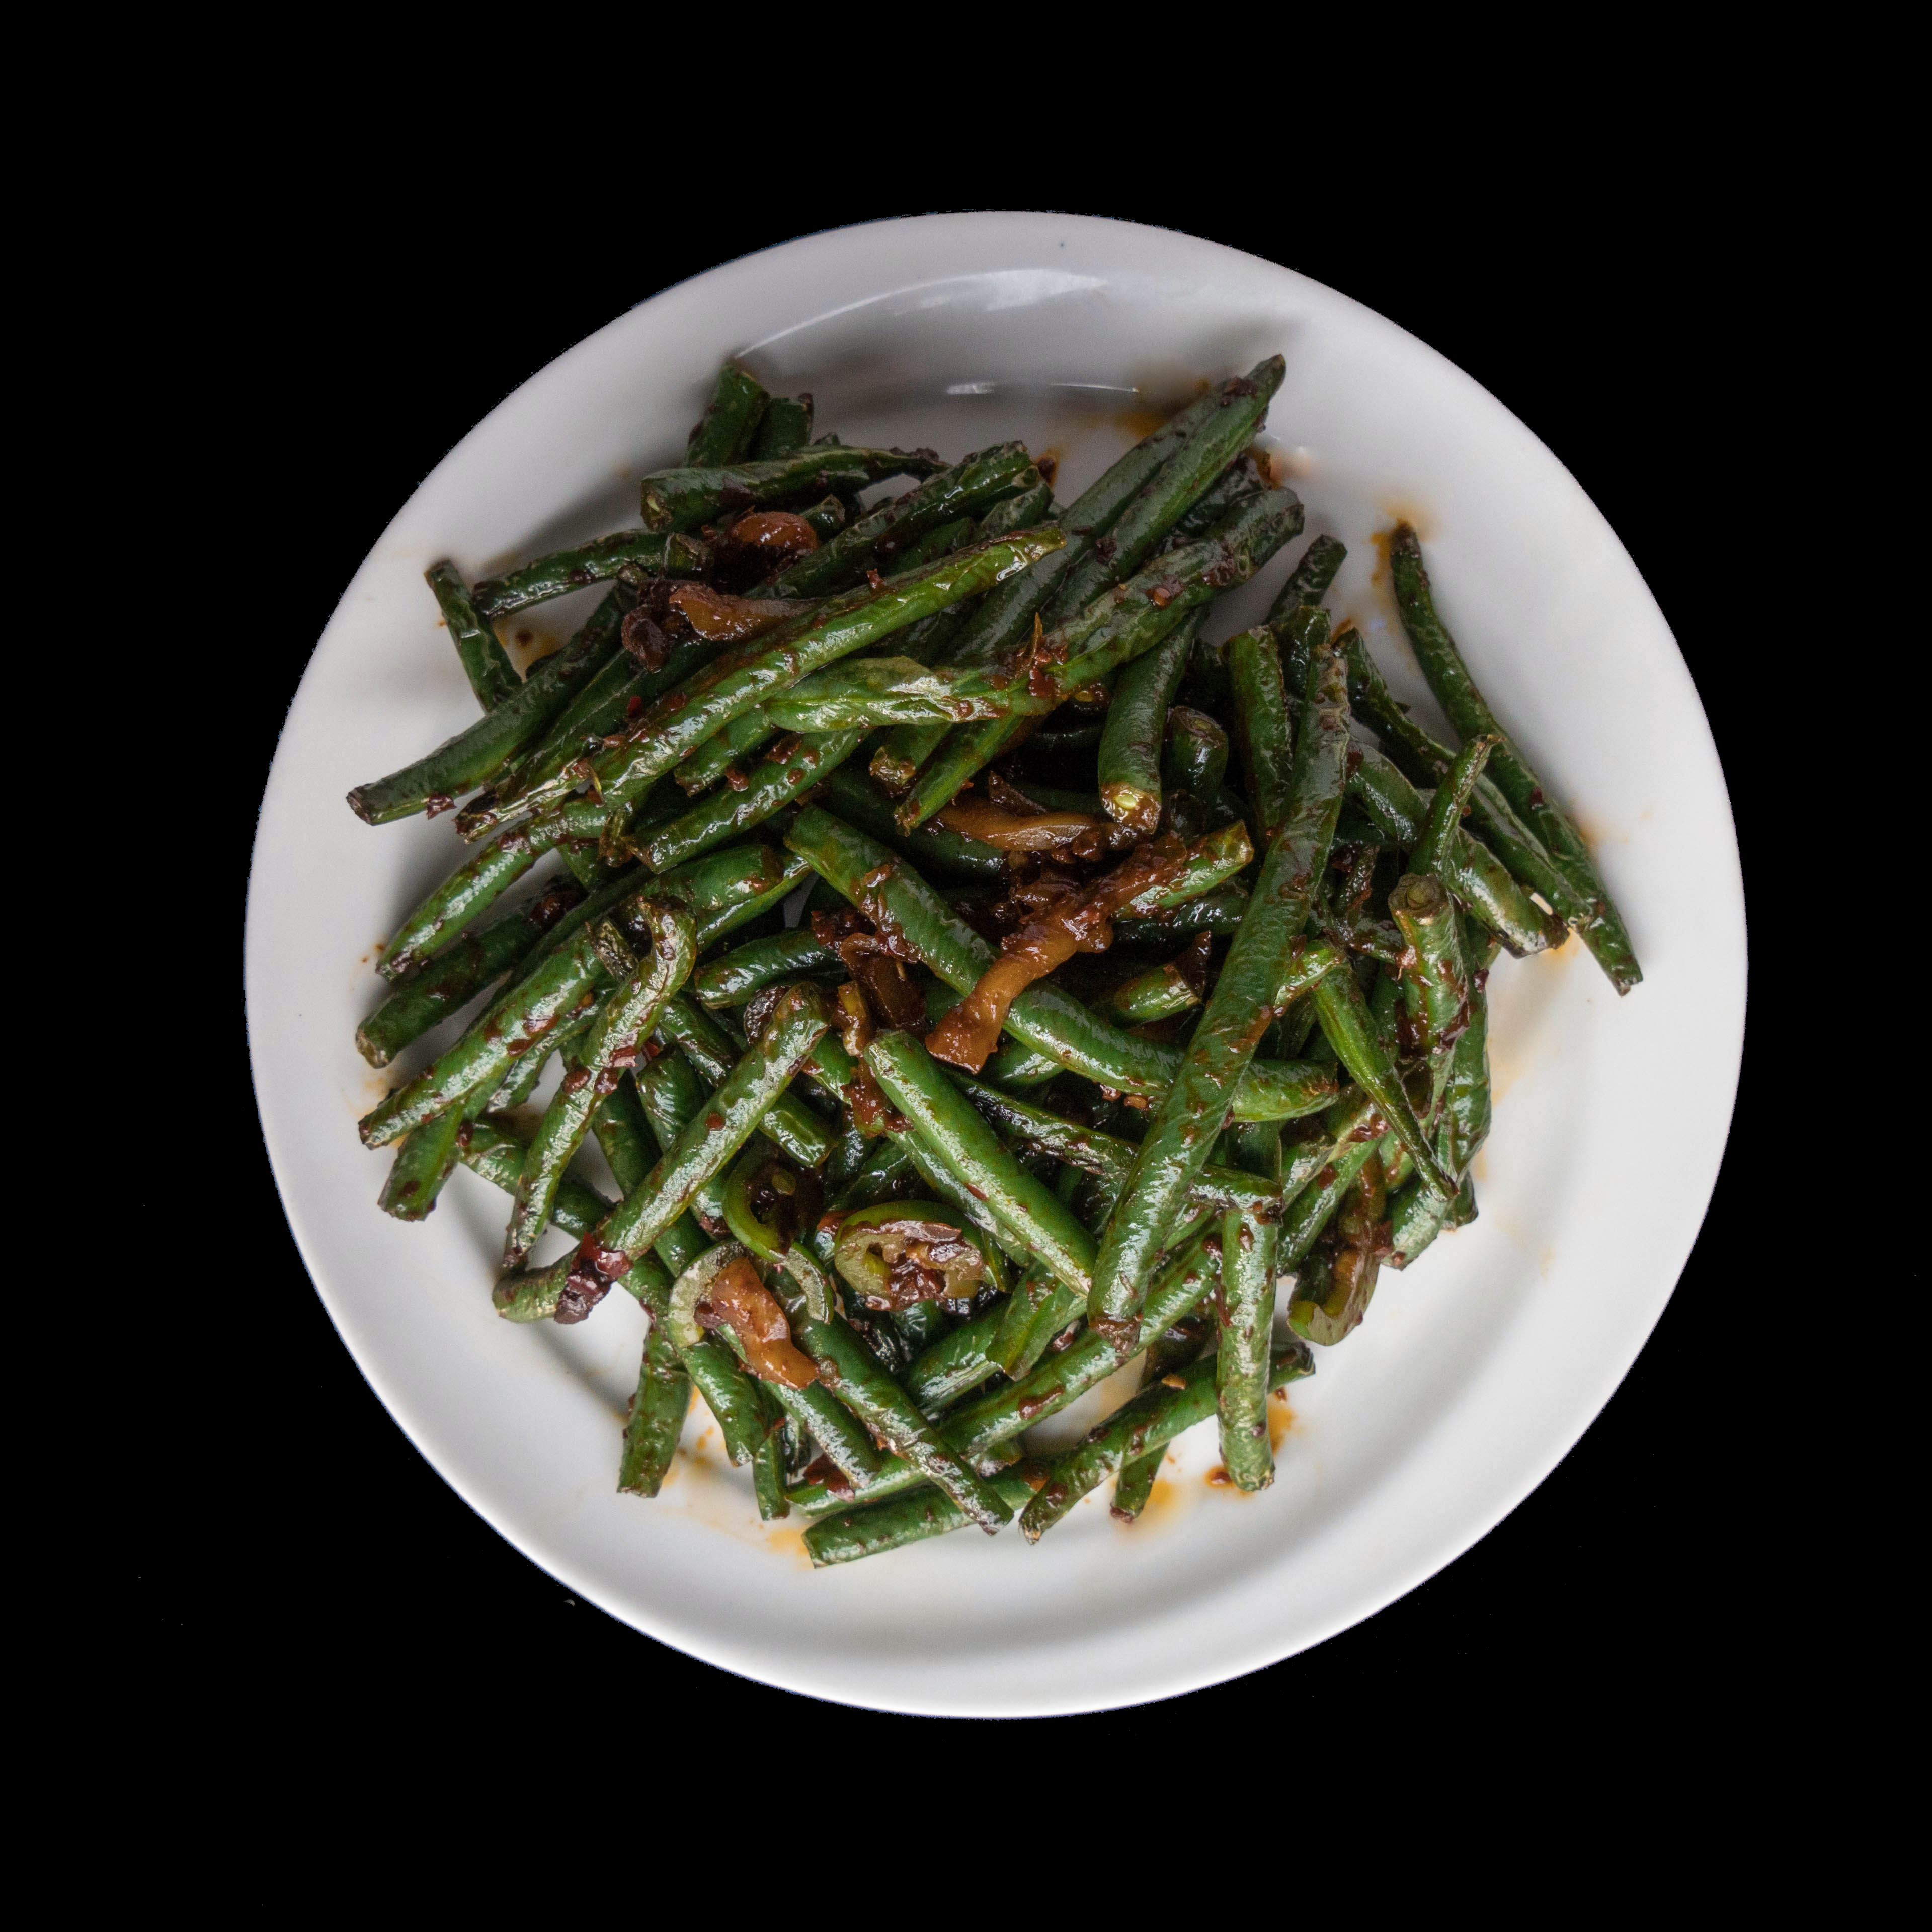 63. 干煸四季豆 House Special Green Beans